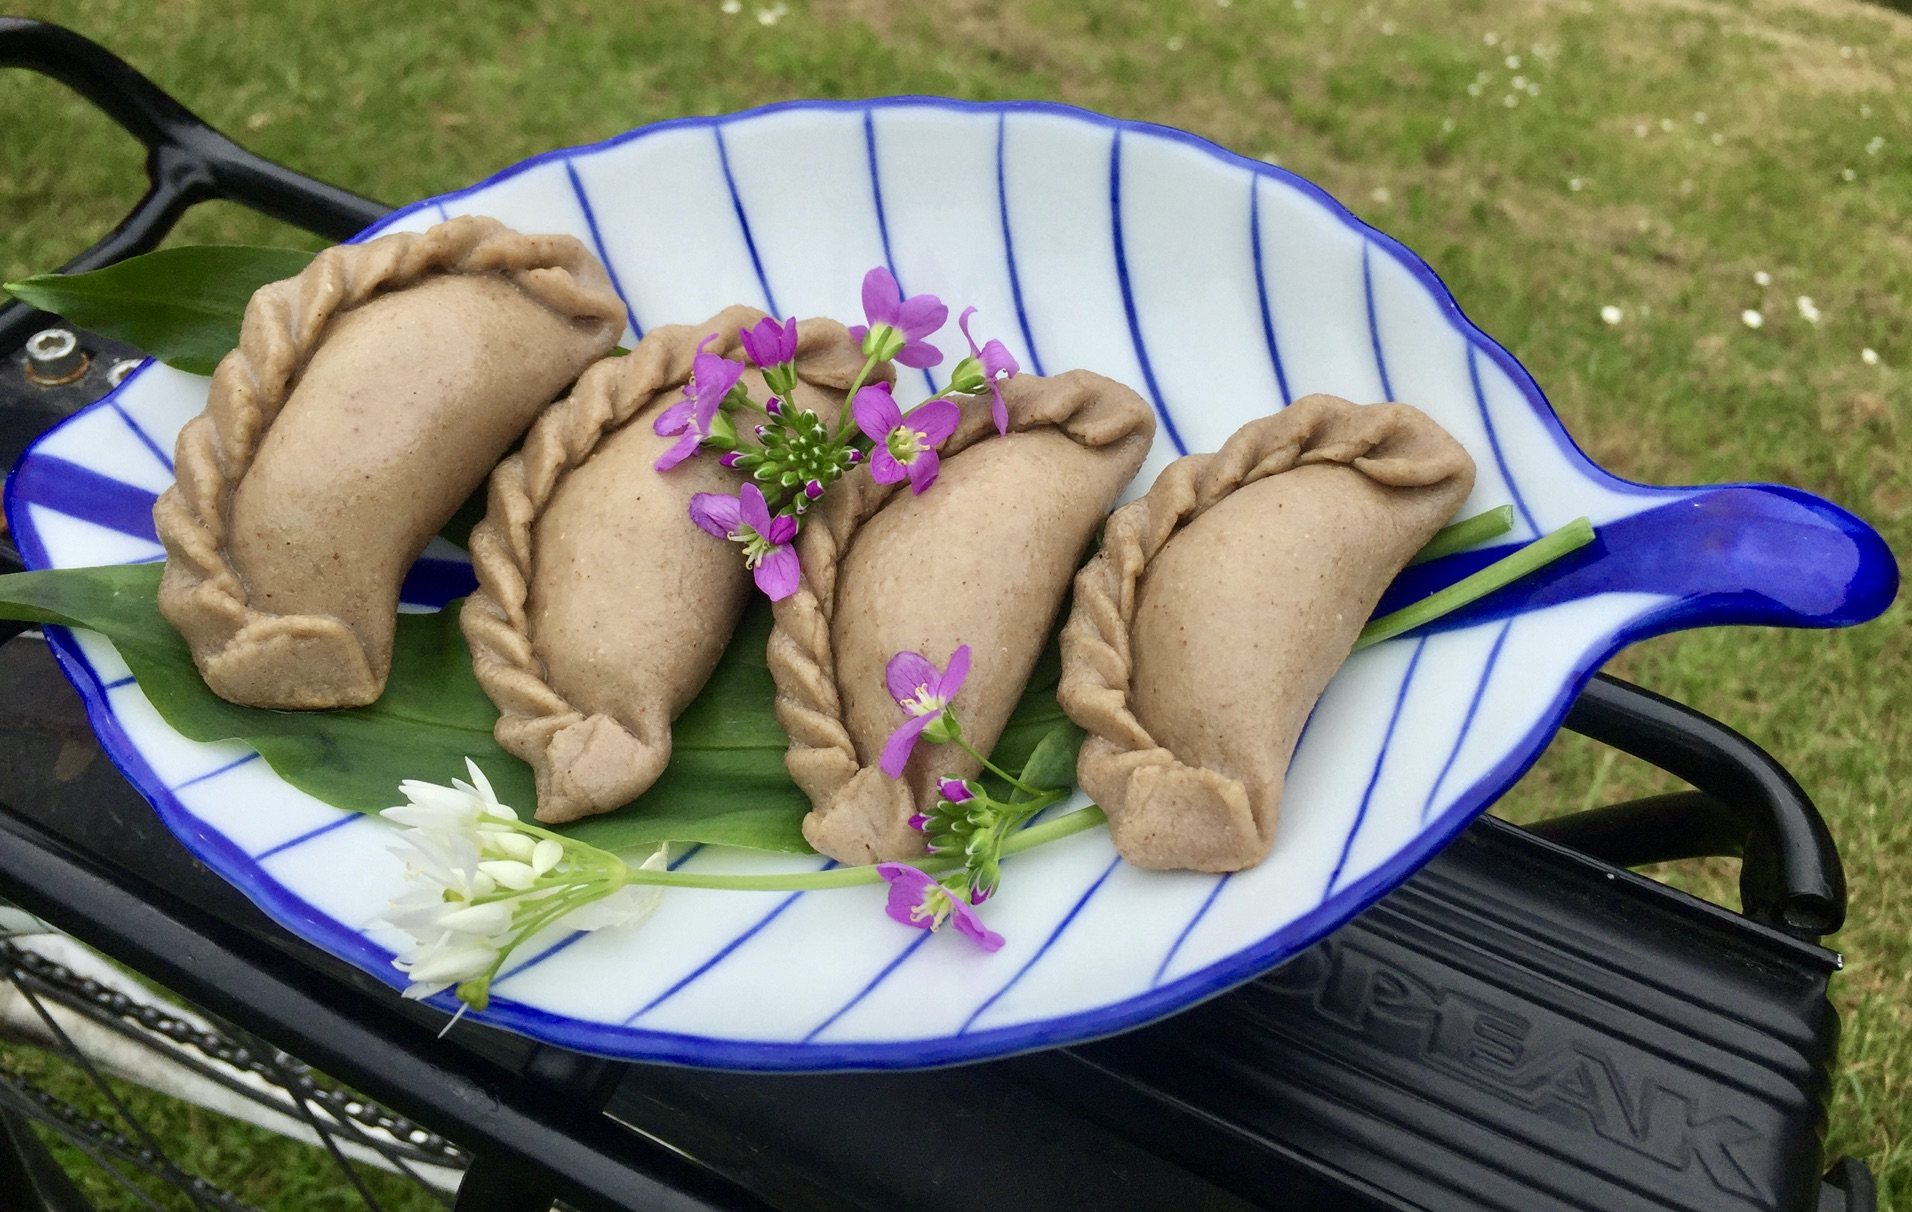 Réussir la cuisson de ses raviolis sarrasin